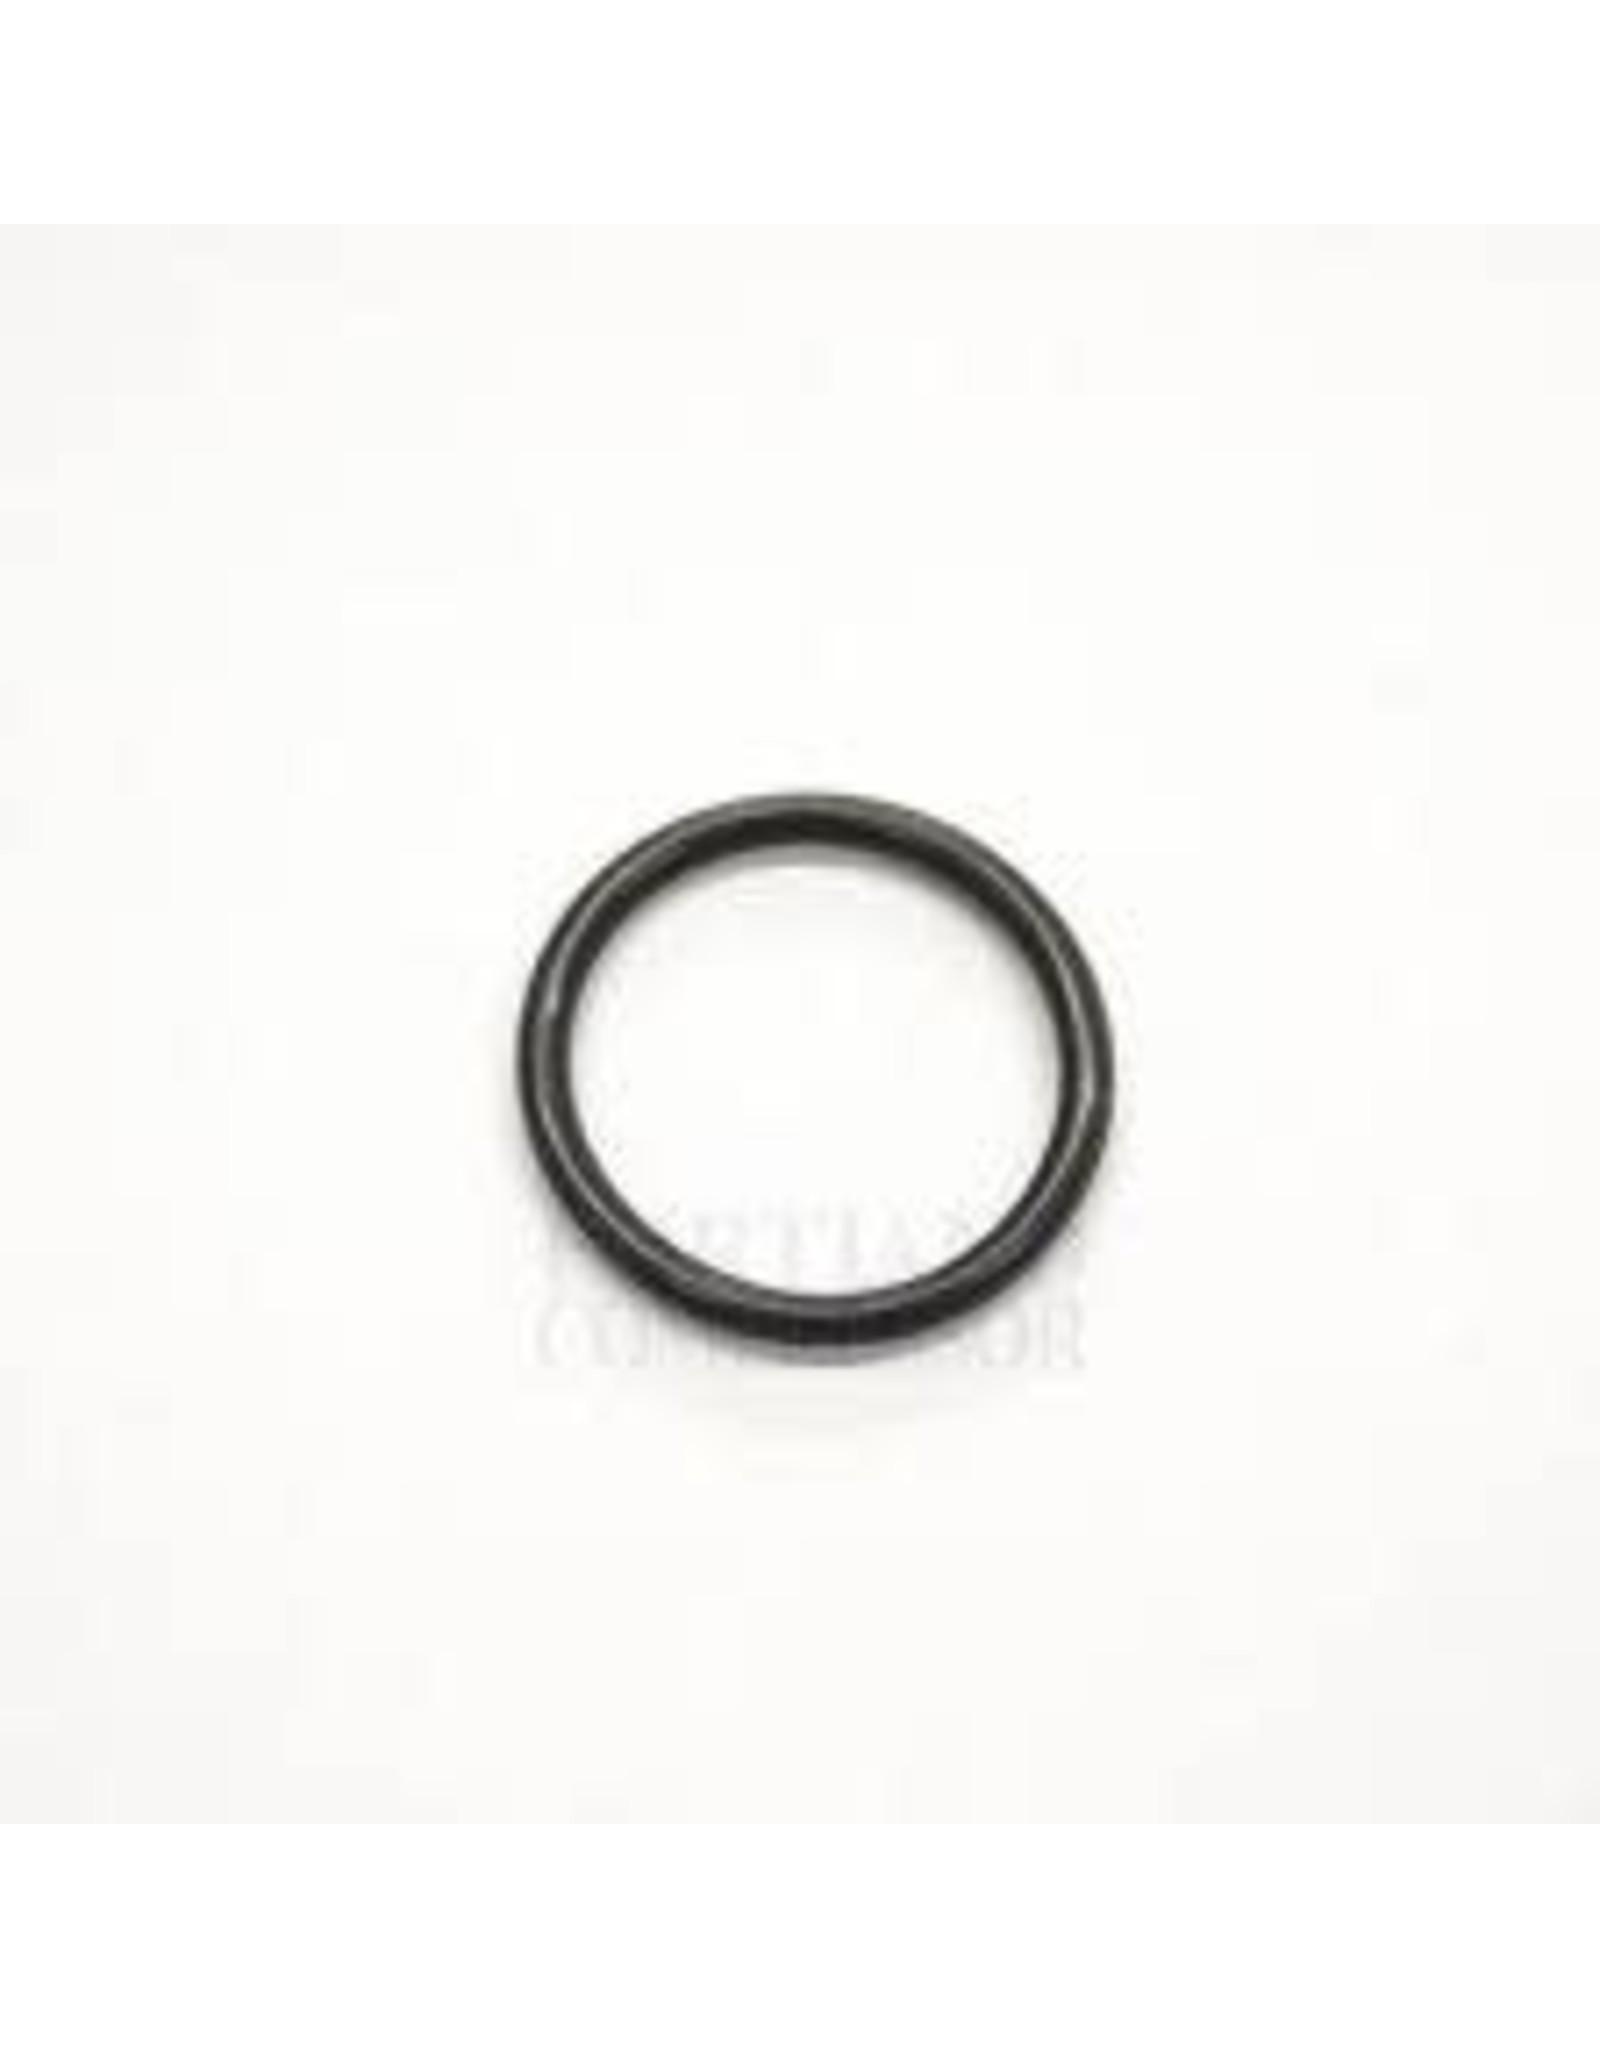 Graco 109576 O-Ring